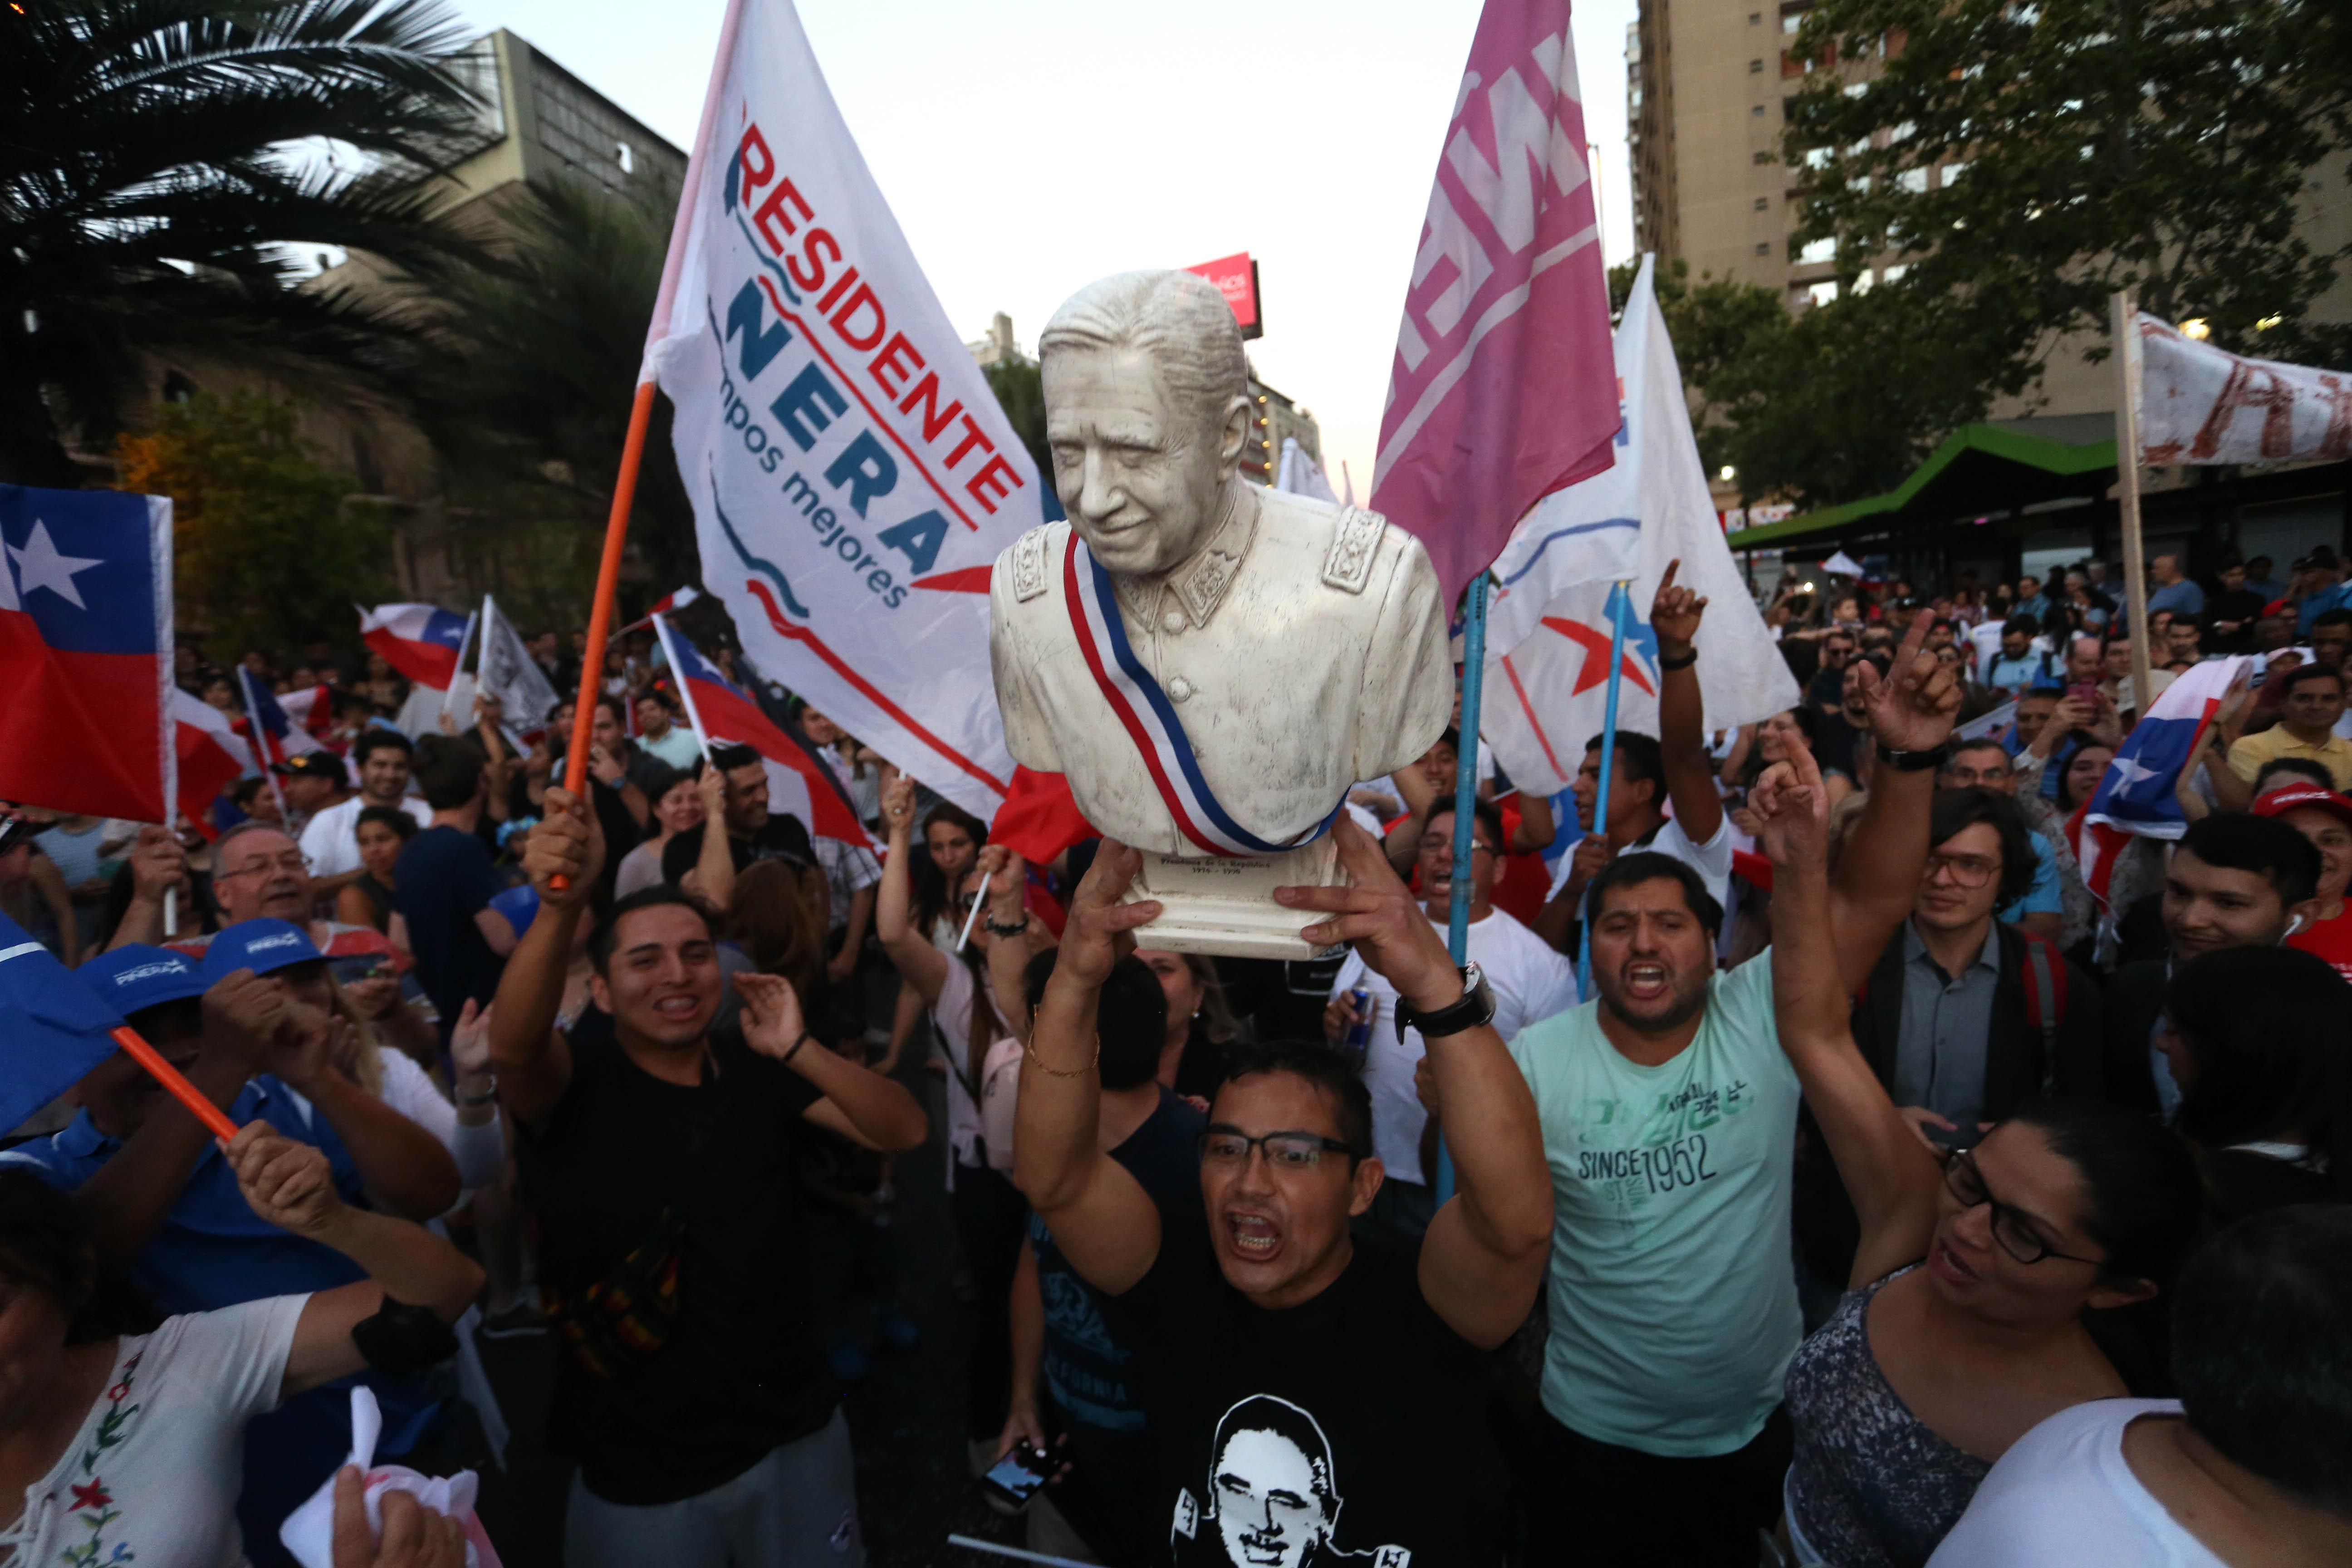 Festejan triunfo de Piñera con busto de Augusto Pinochet [FOTOS — Chile